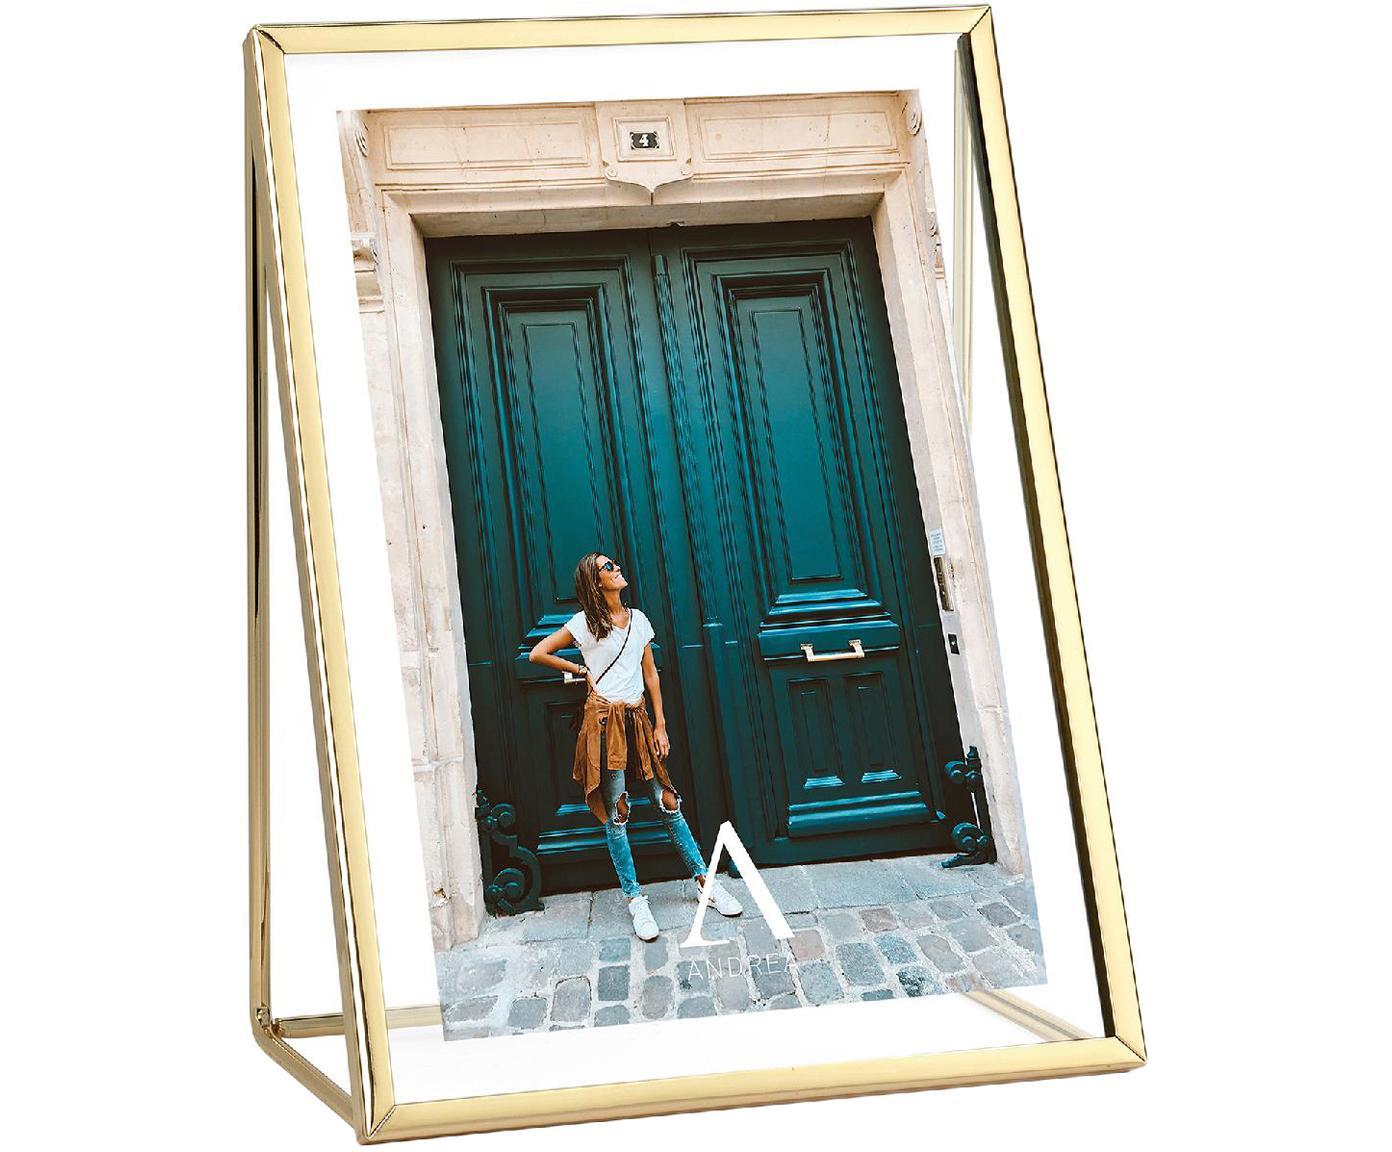 Marco Memi, Asiento: borgoña patas: madera de haya, 13 x 18 cm